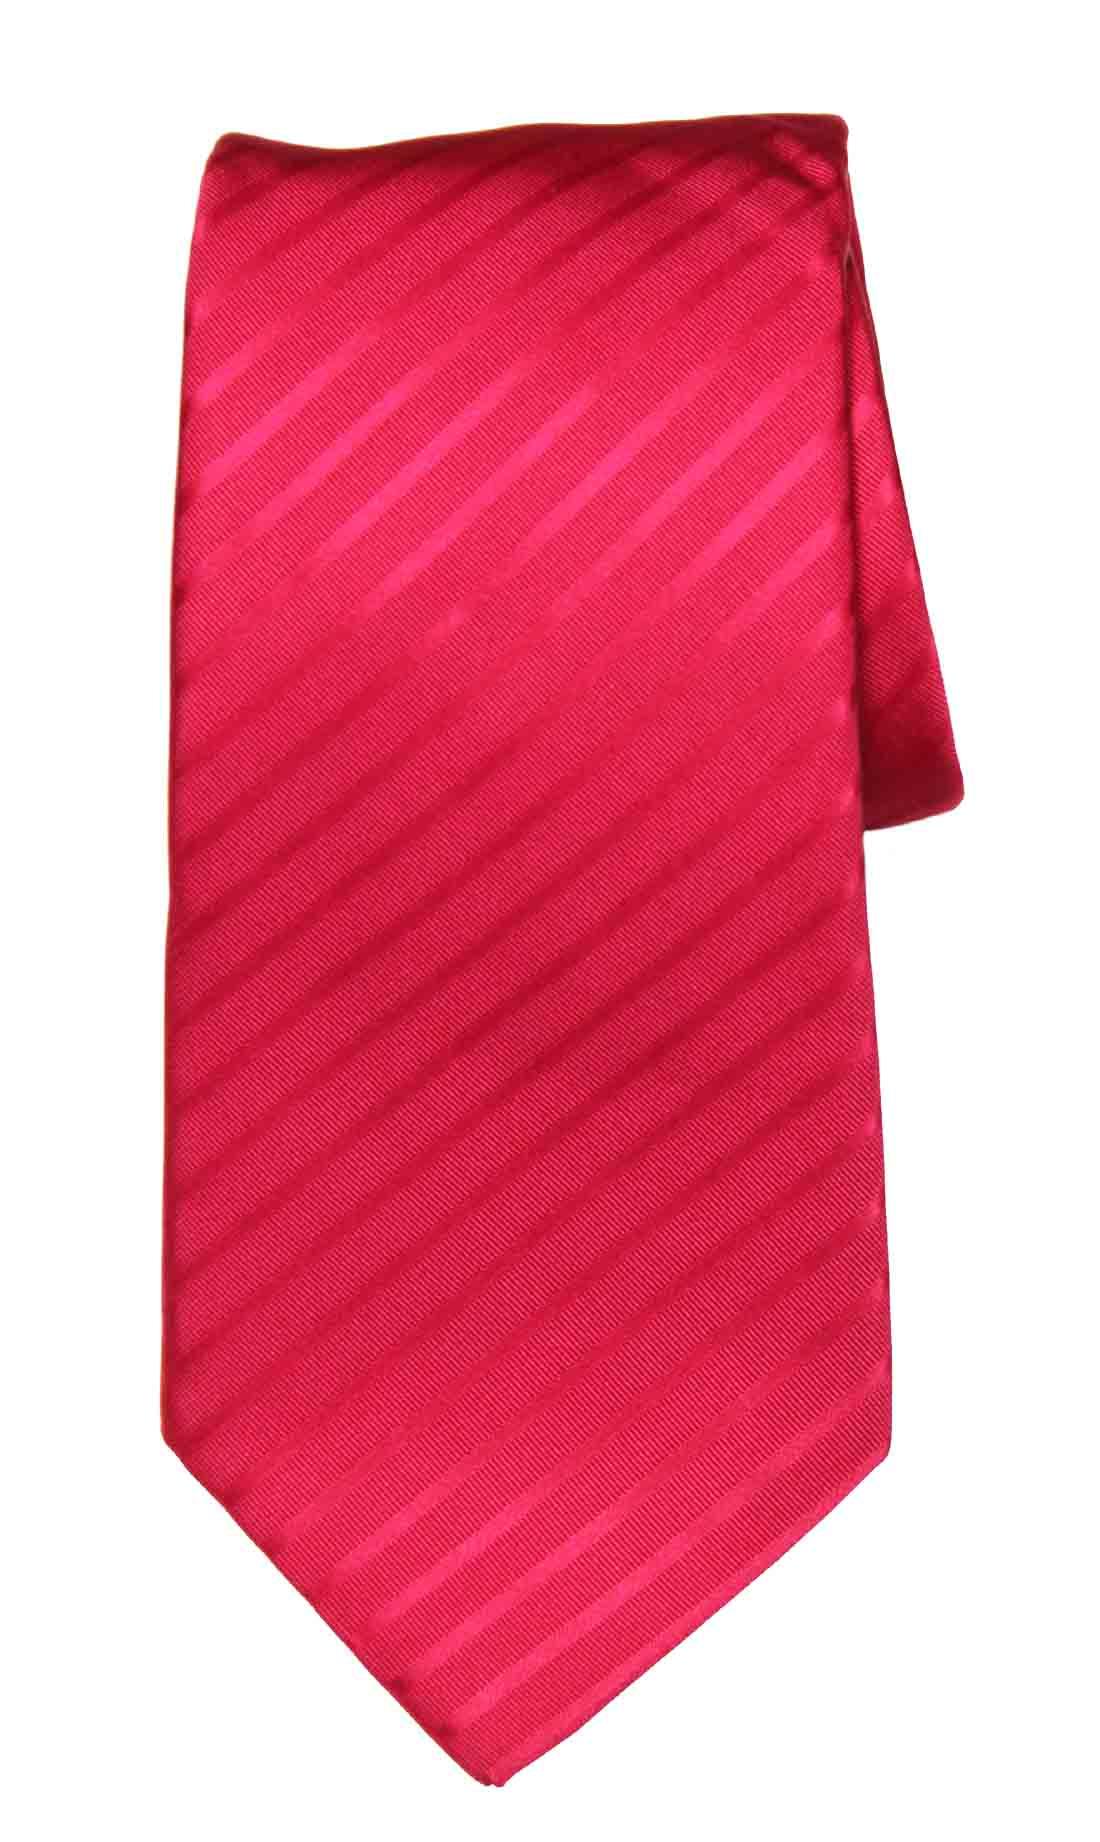 Thomas Pink English Silk Tie Striped Waltham Men's